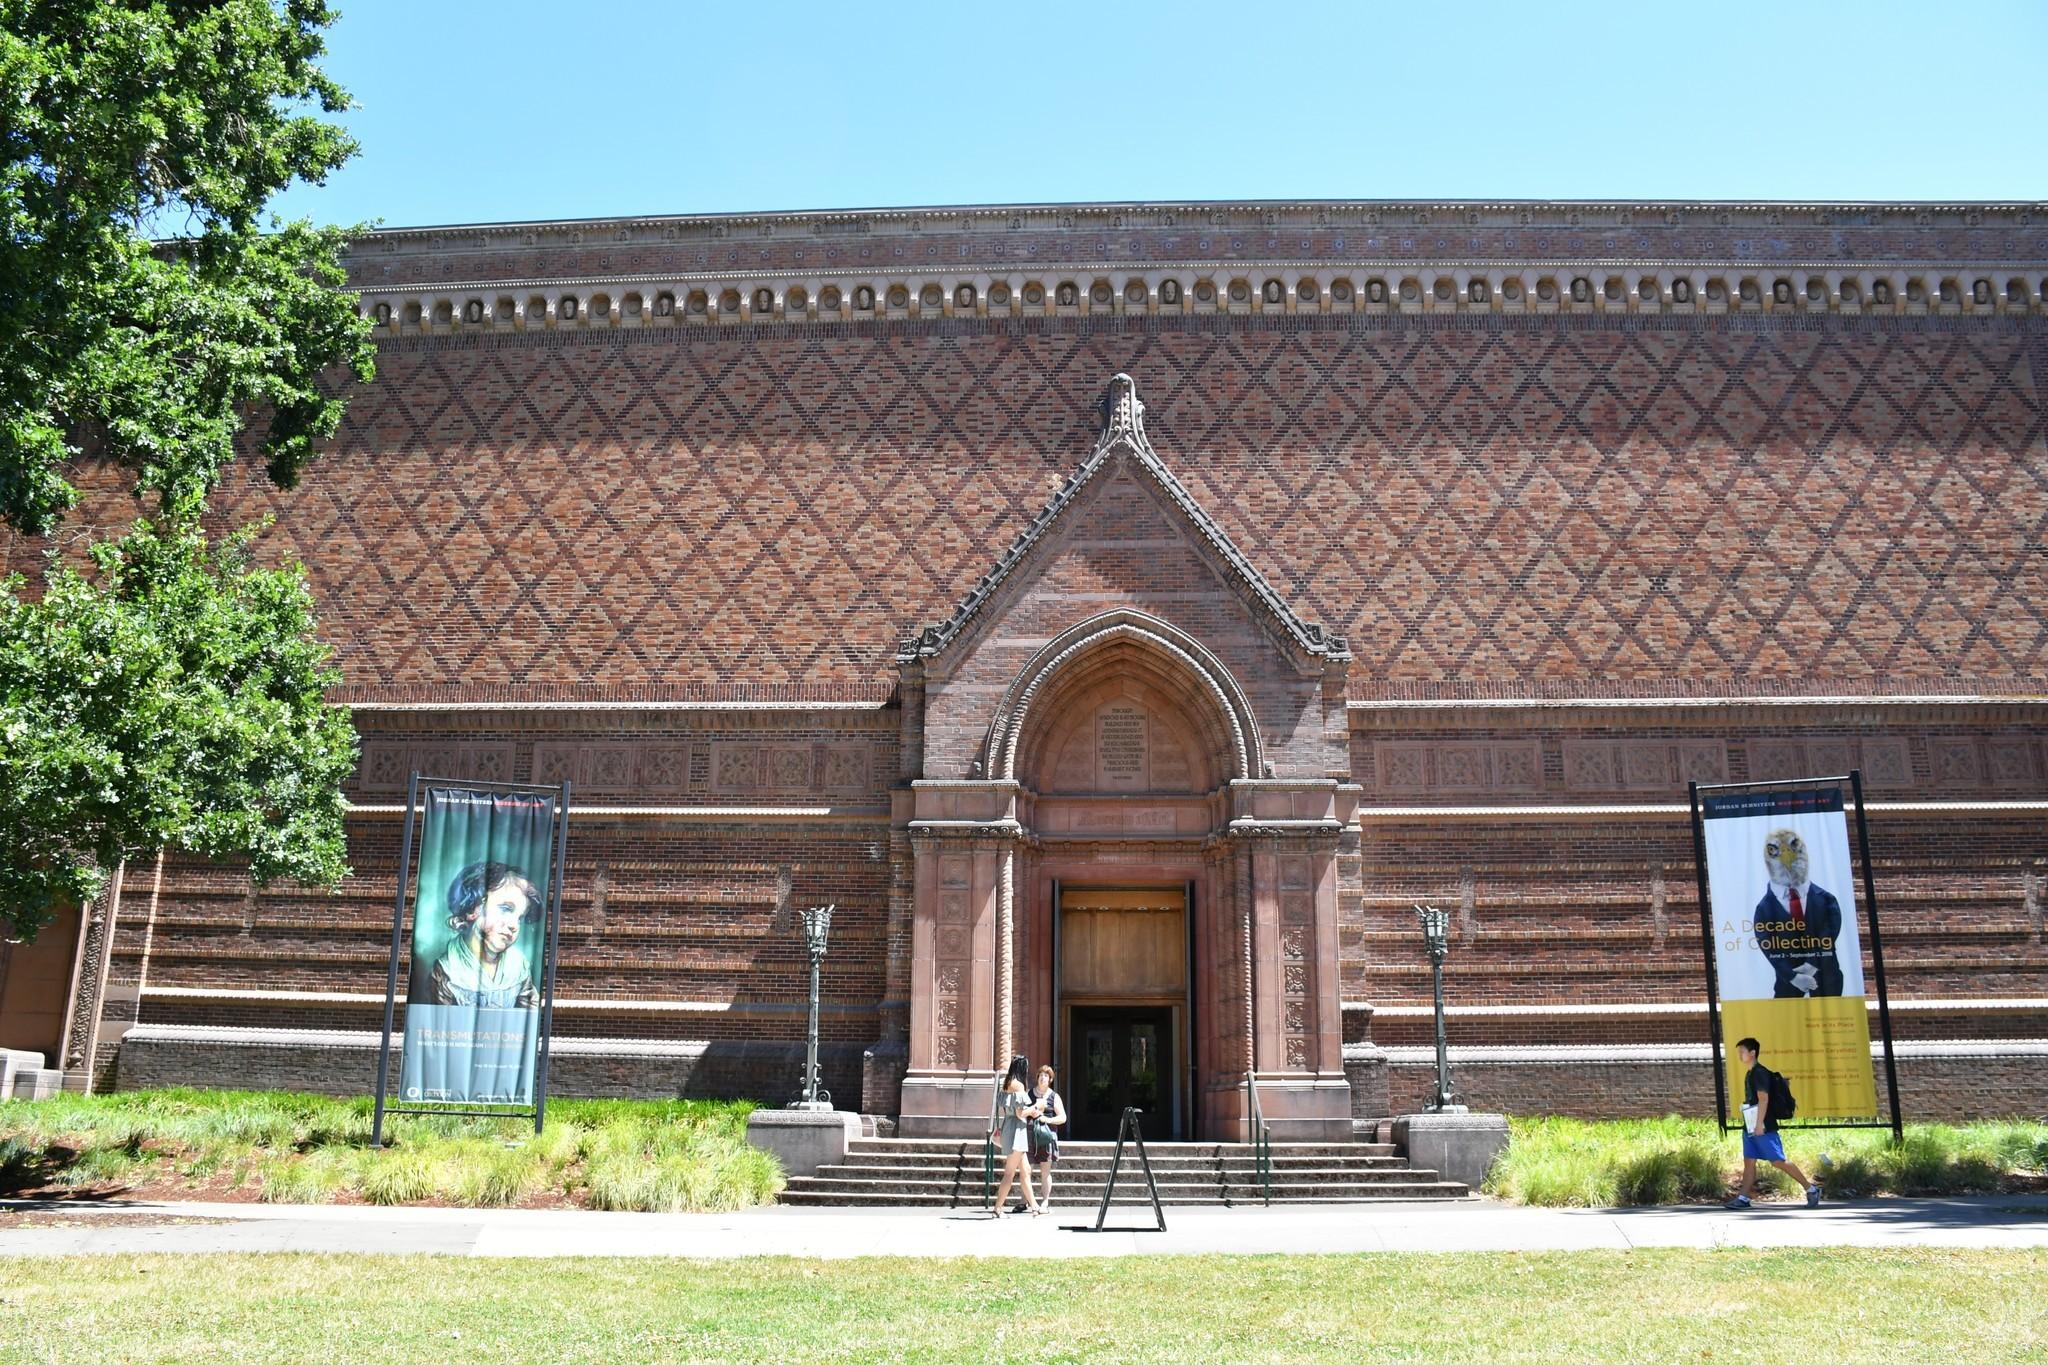 Jordan Schnitzer Museum Of Art Baltimore Sun - Jordan schnitzer museum